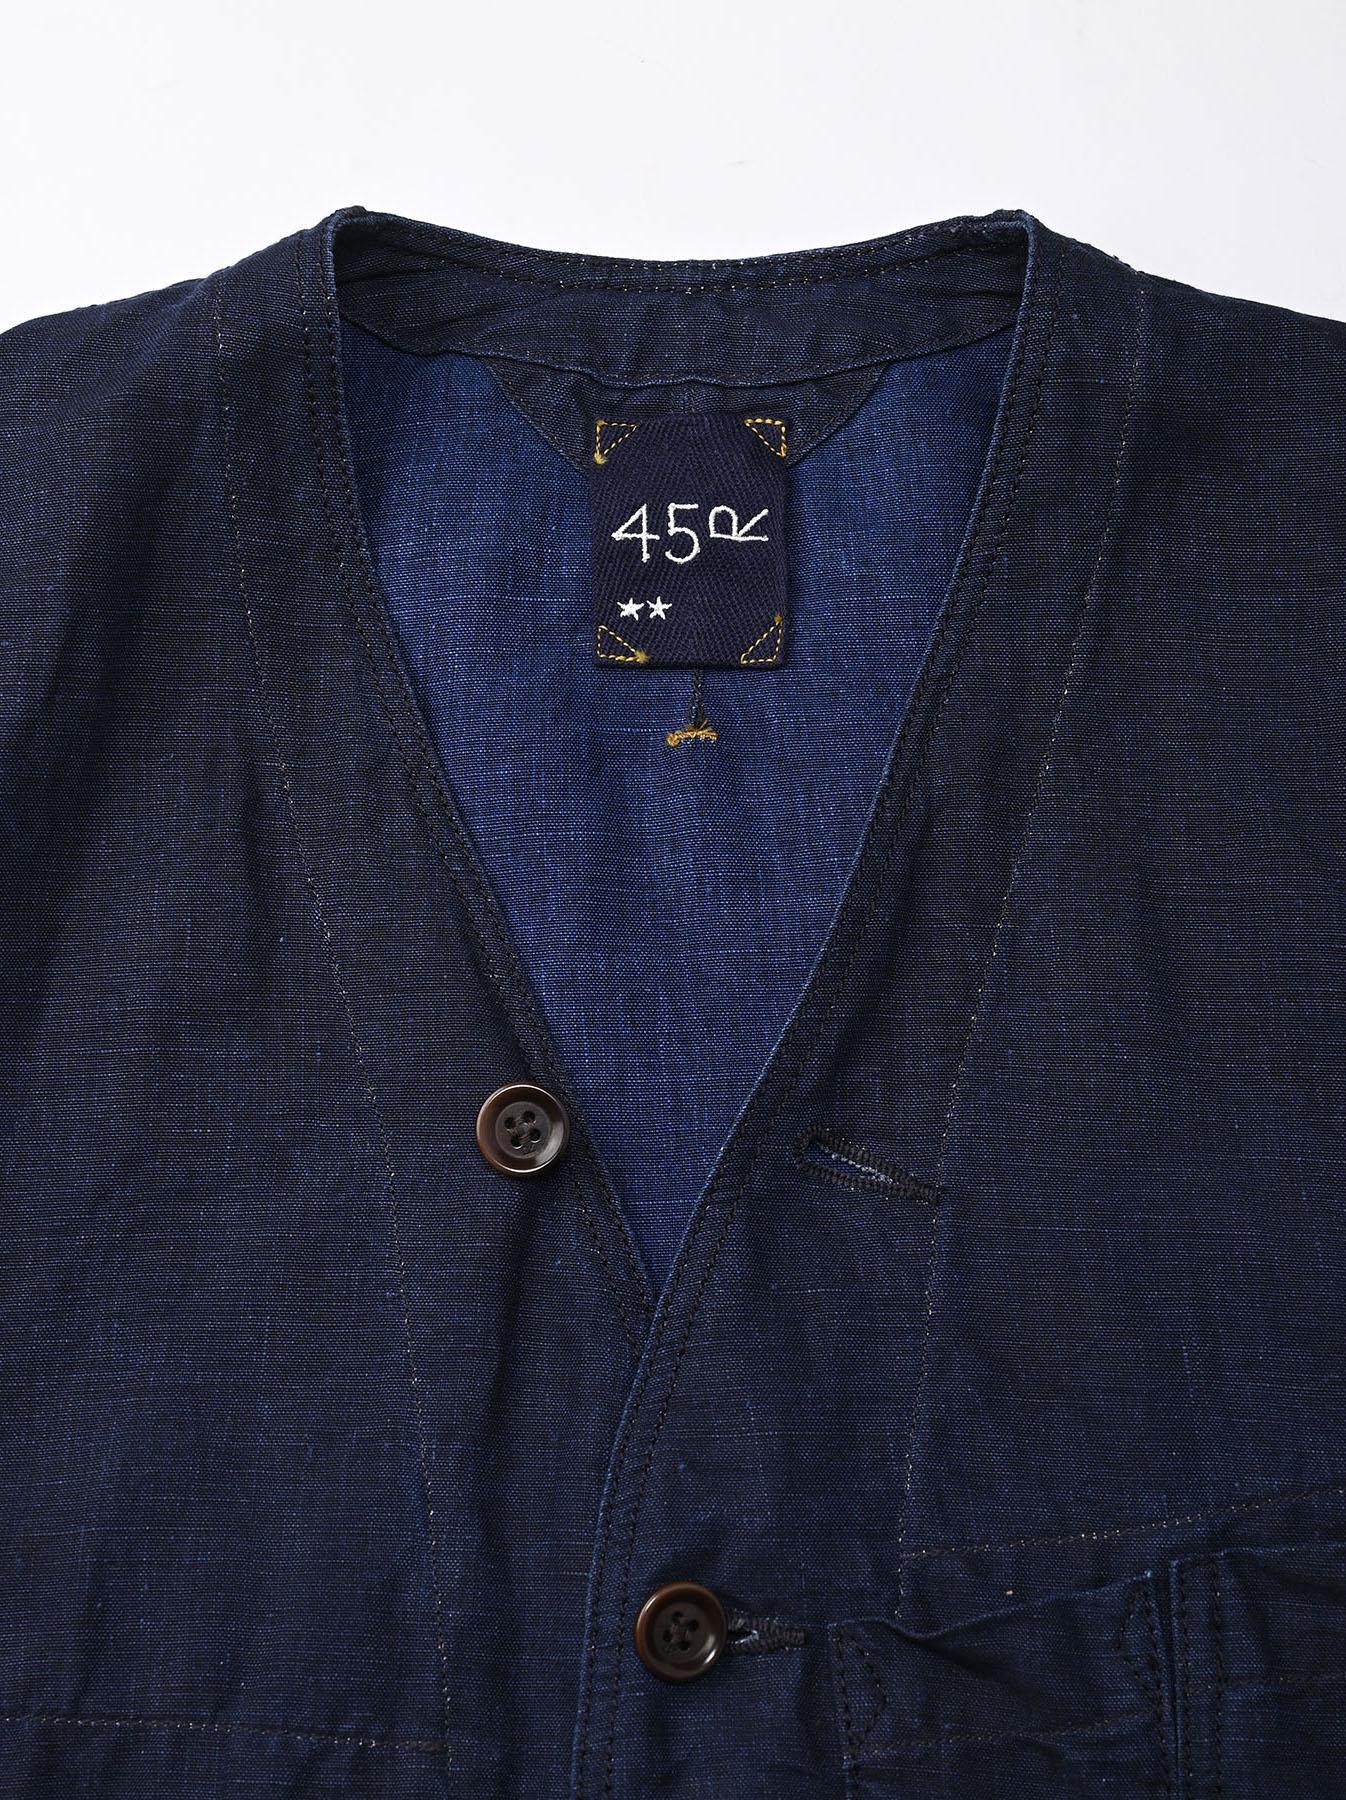 Indigo Linen 908 V-neck Coverall (0421)-9